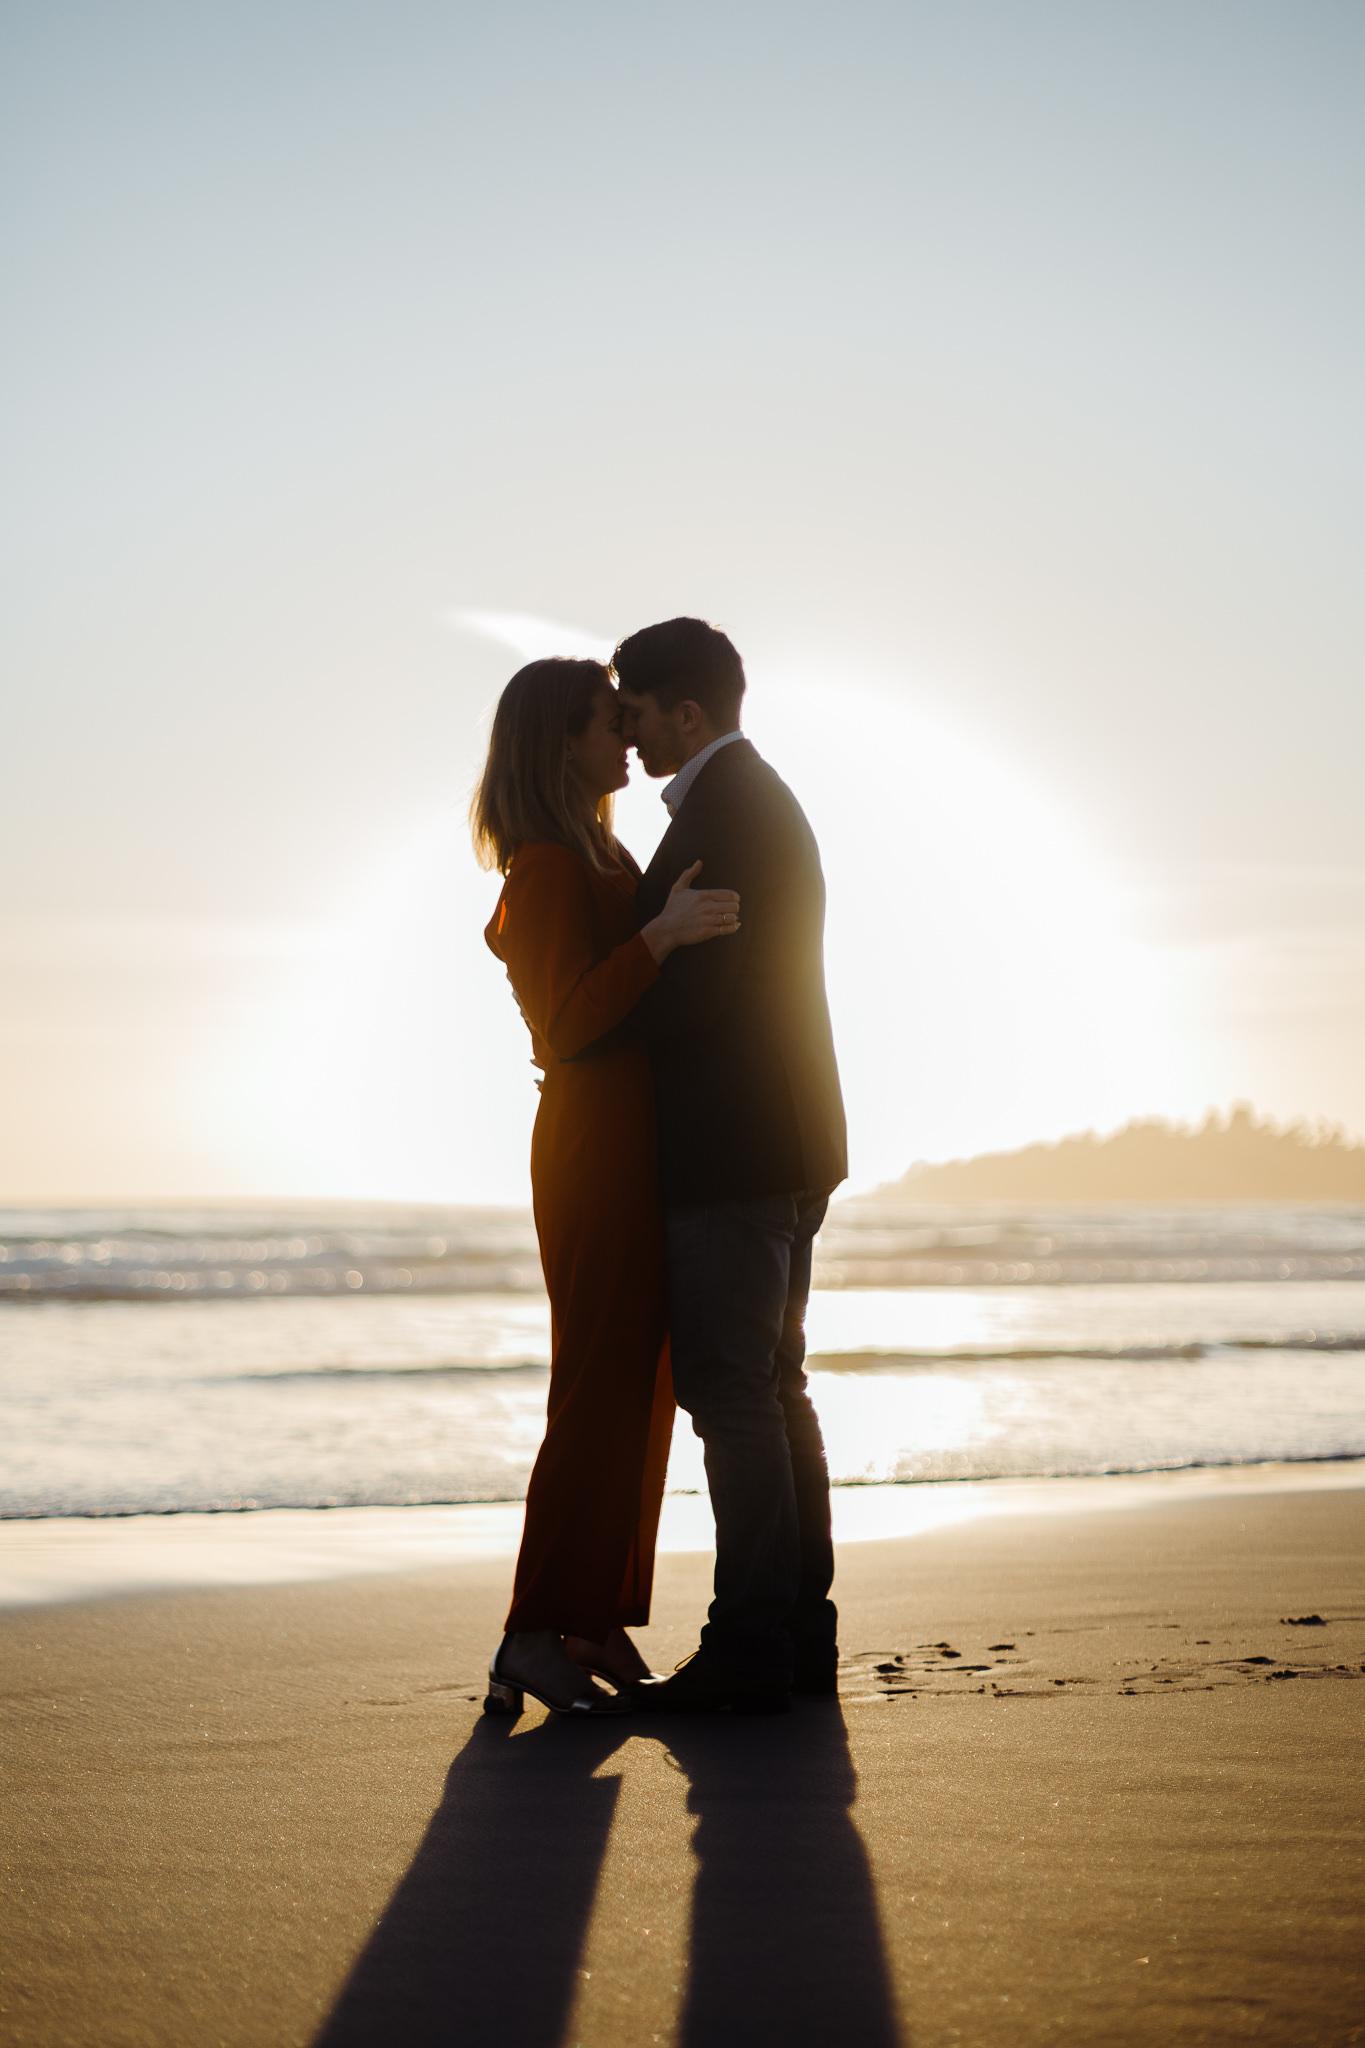 Archer Inspired Photography Carmel Beach California Wedding Engagement Lifestyle Anniversary Natural Light Photographer-21.jpg